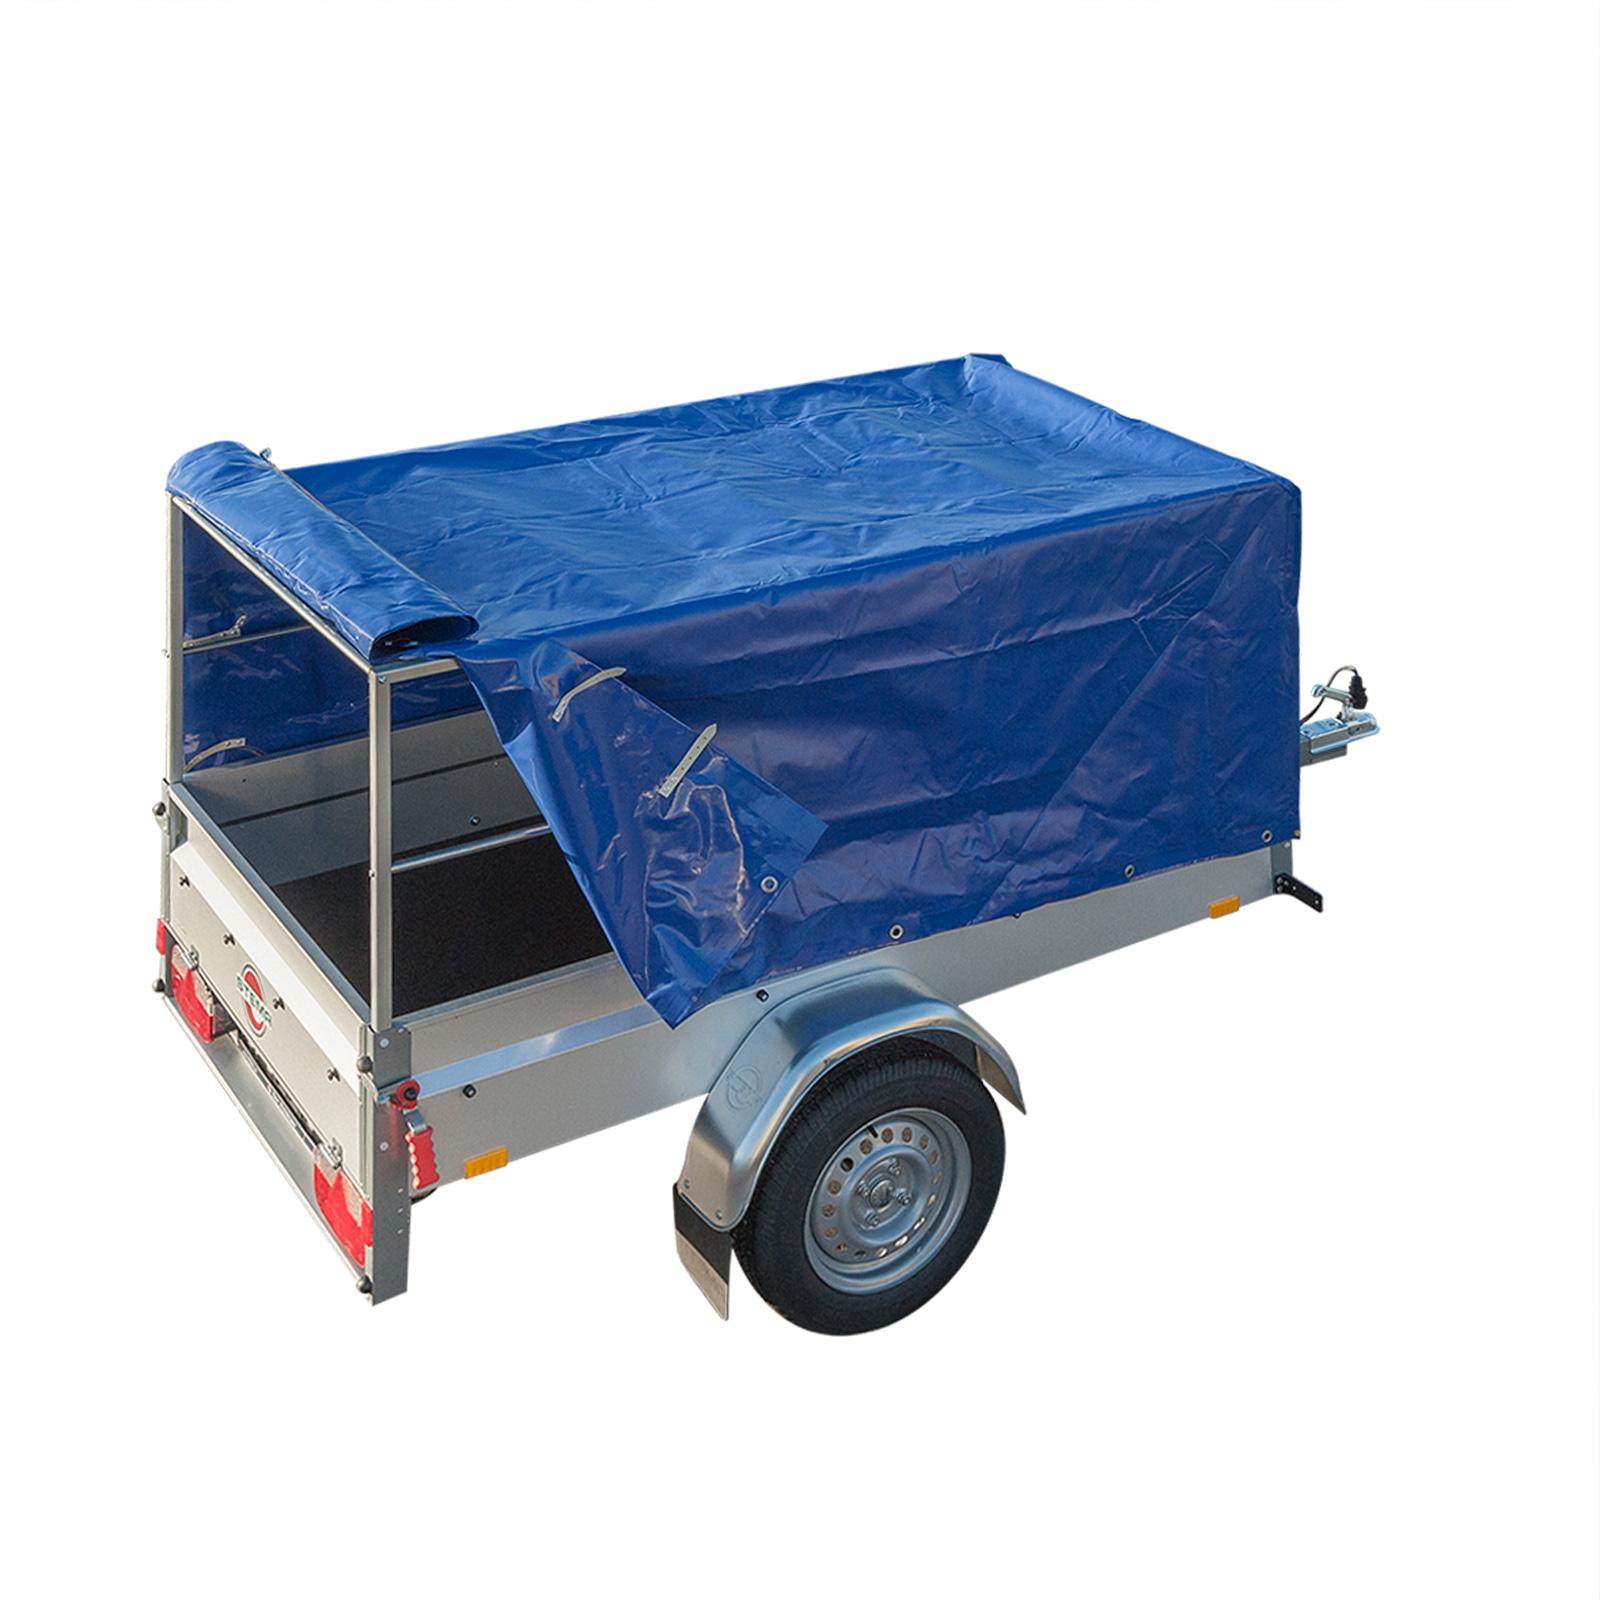 planen gestell hochplane set blau ma e 207 5 x 114 x. Black Bedroom Furniture Sets. Home Design Ideas